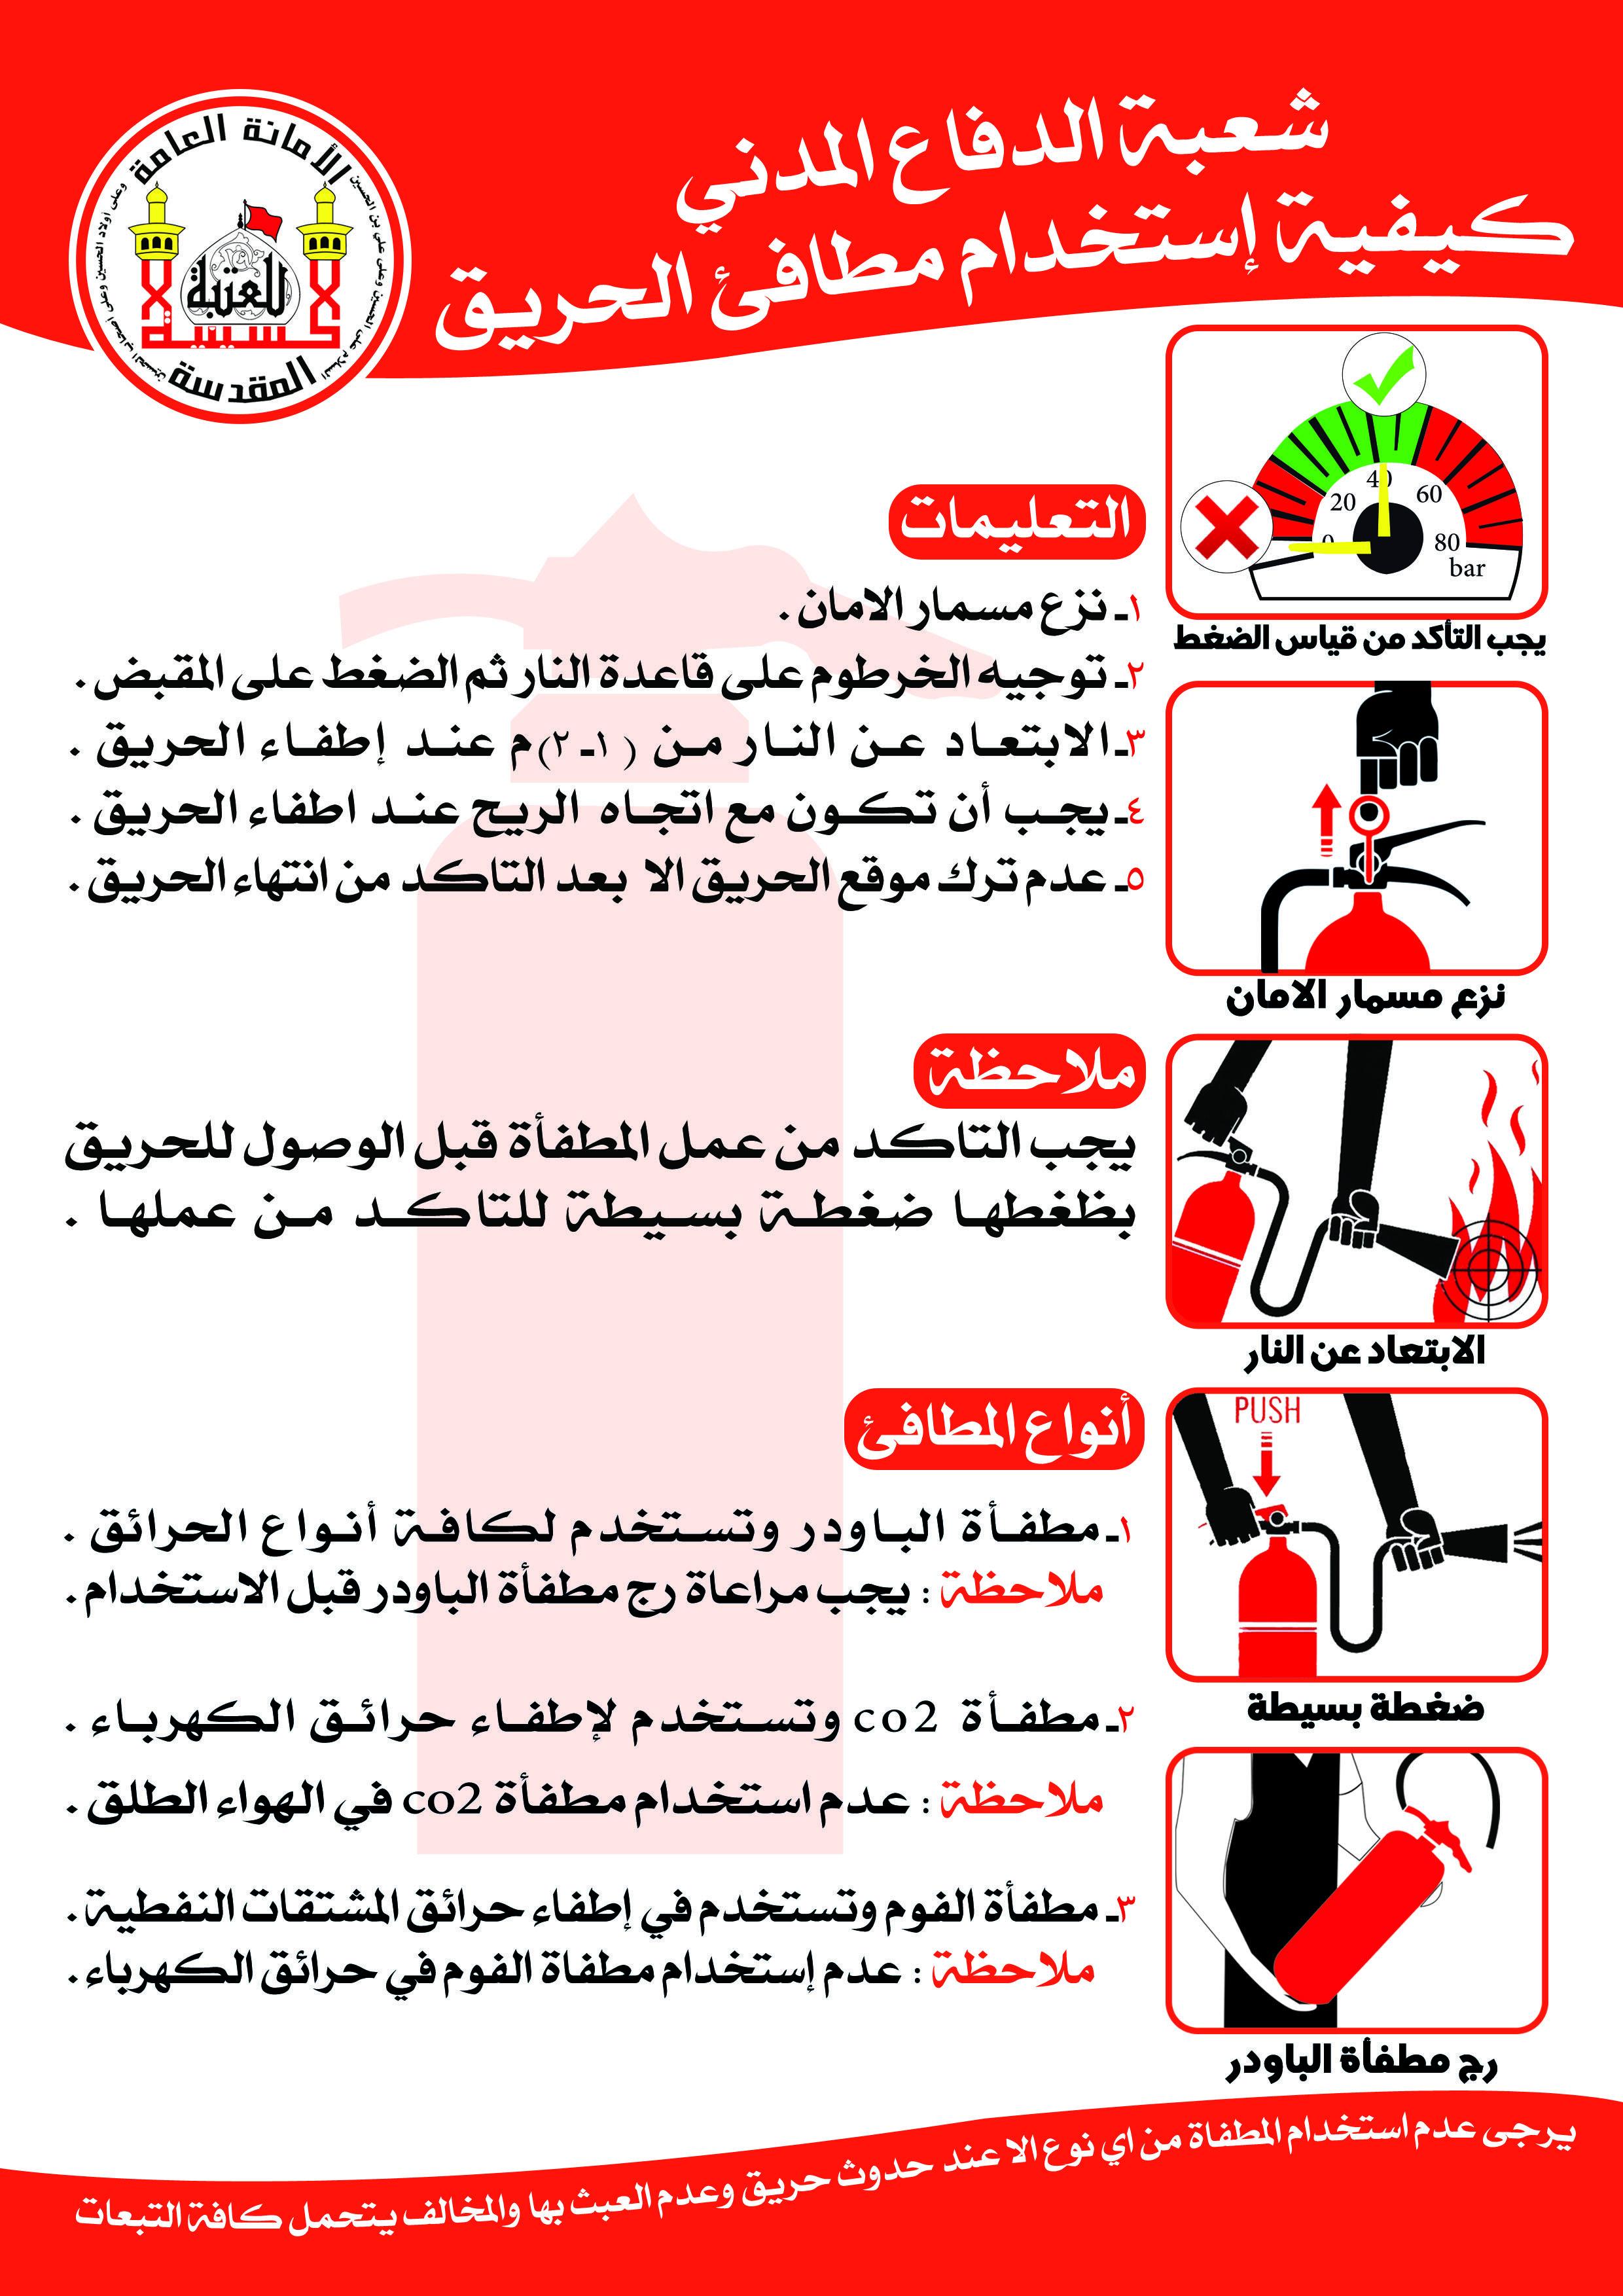 كيفية استخدام مطافئ الحريق How To Use Fire Extinguishers Brochure Brochure Fire Extinguishers Photoshop